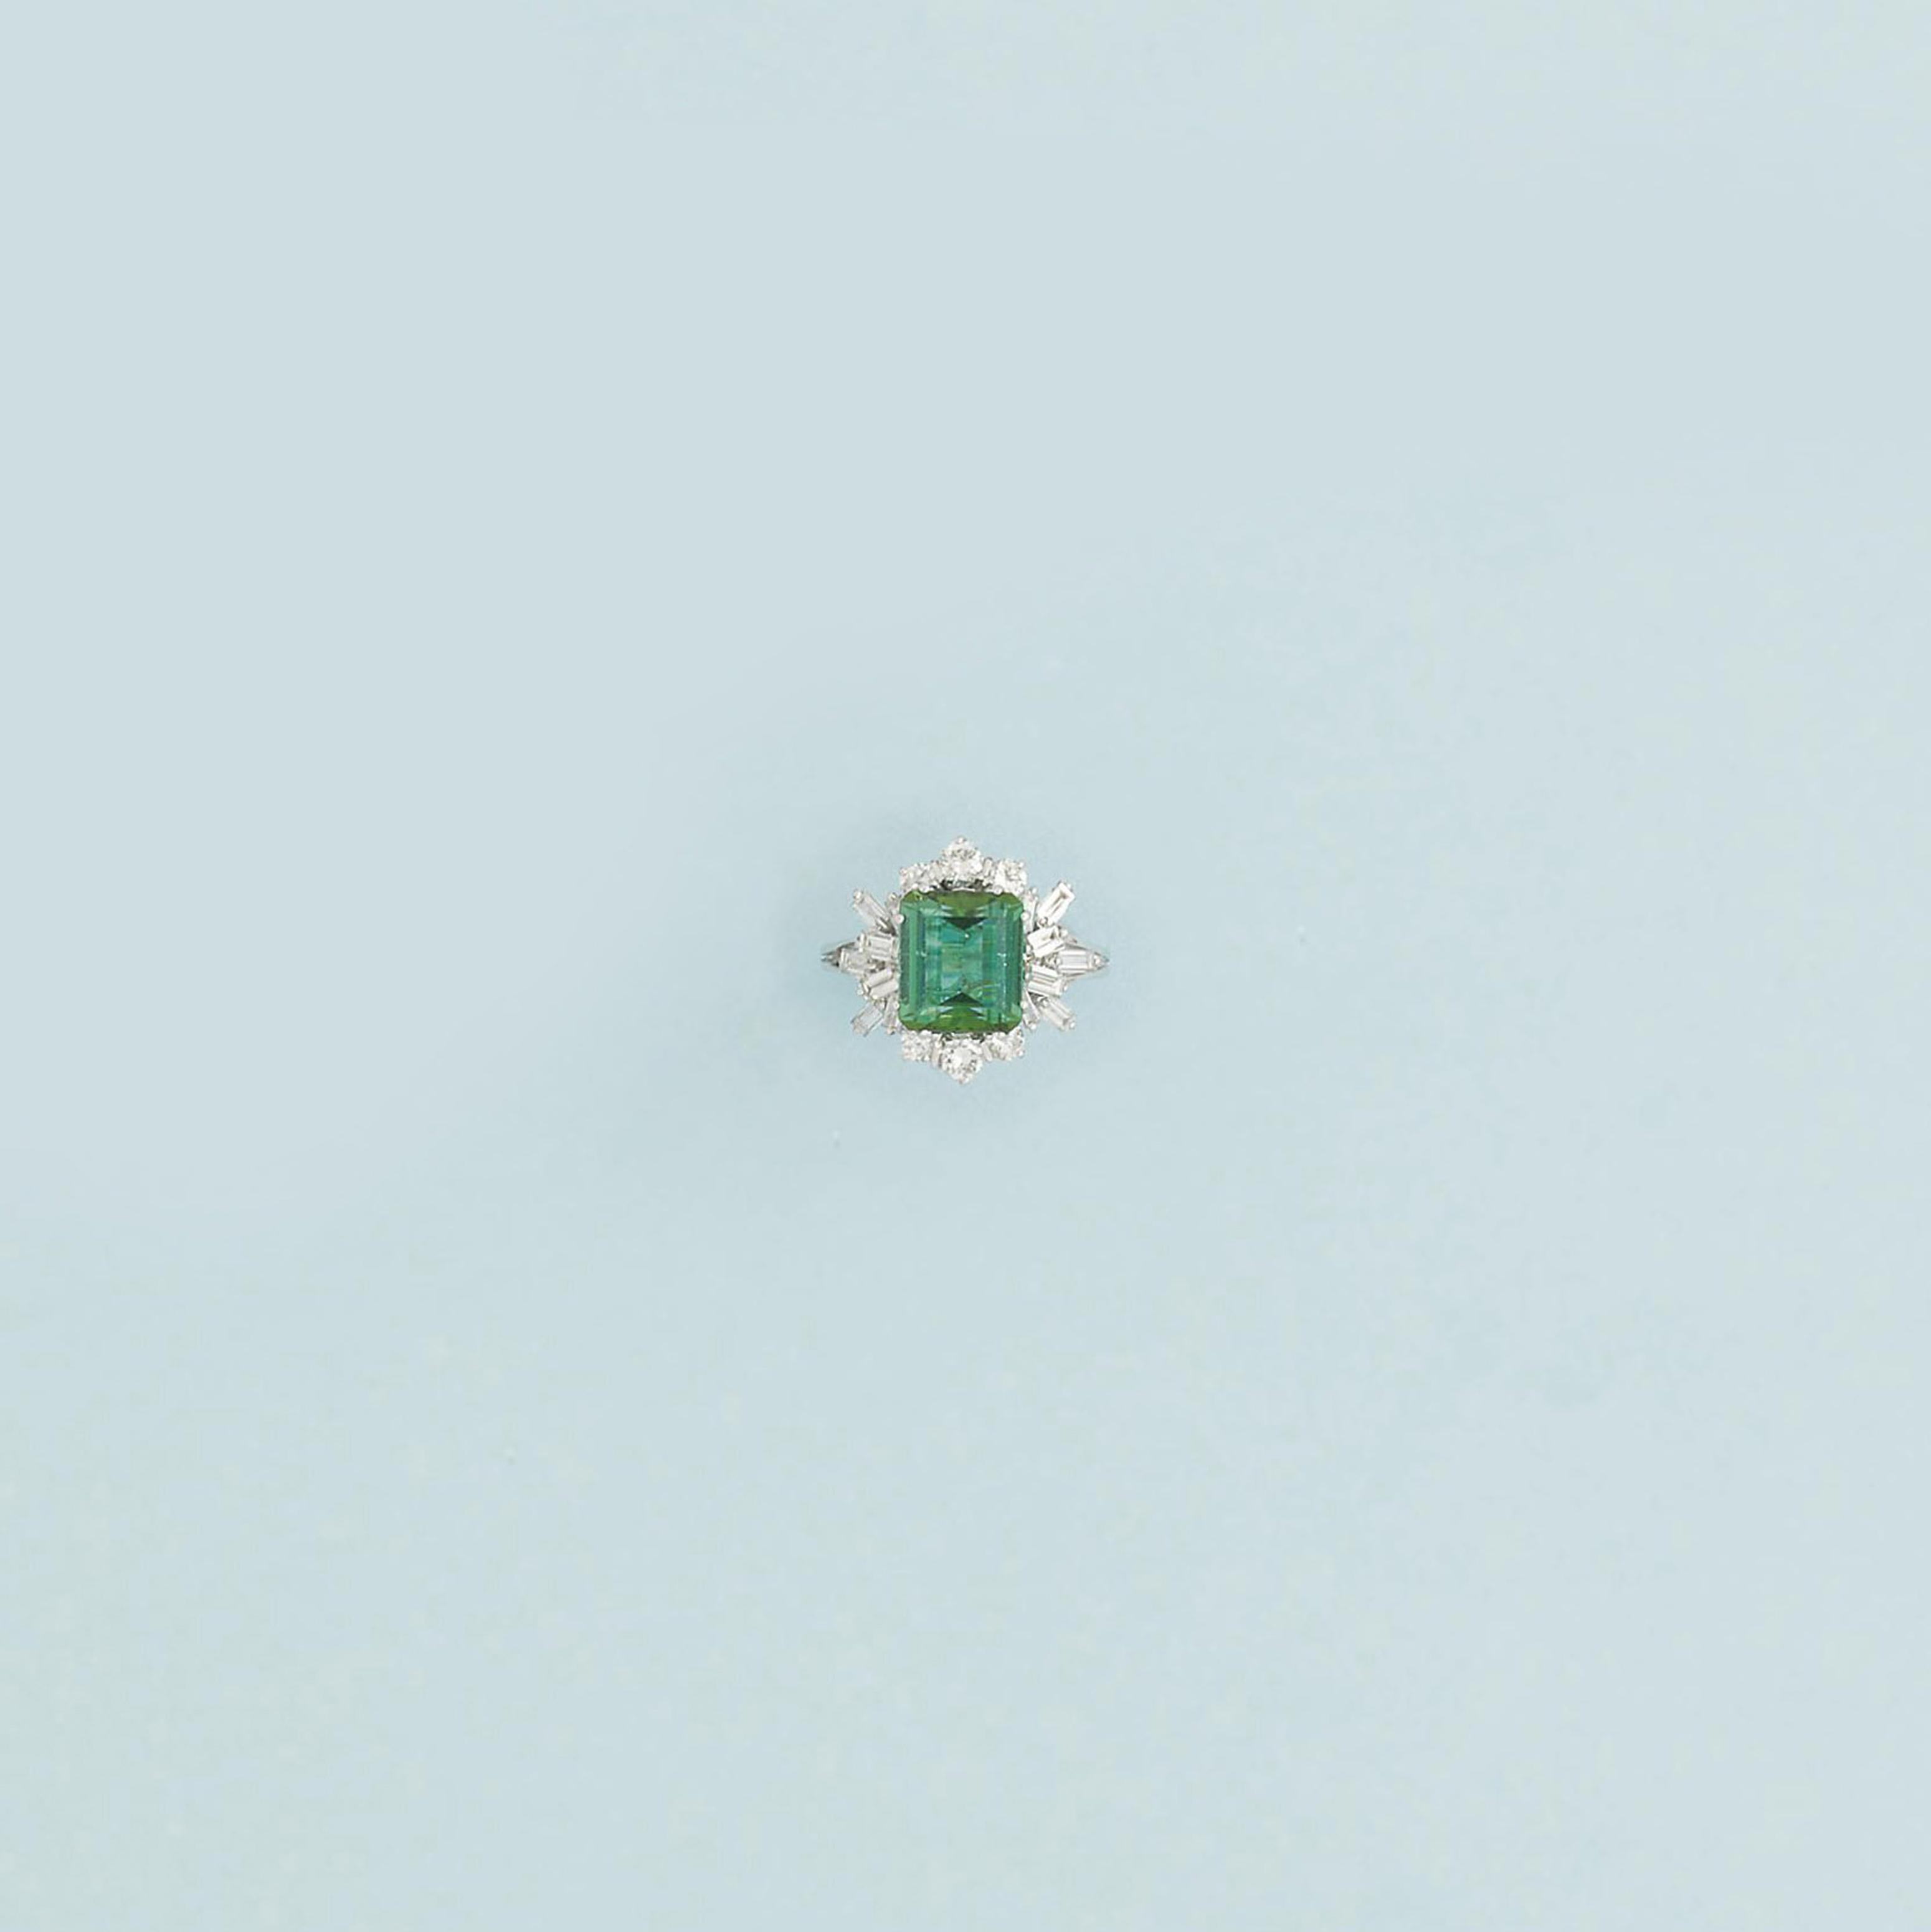 A green tourmaline and diamond